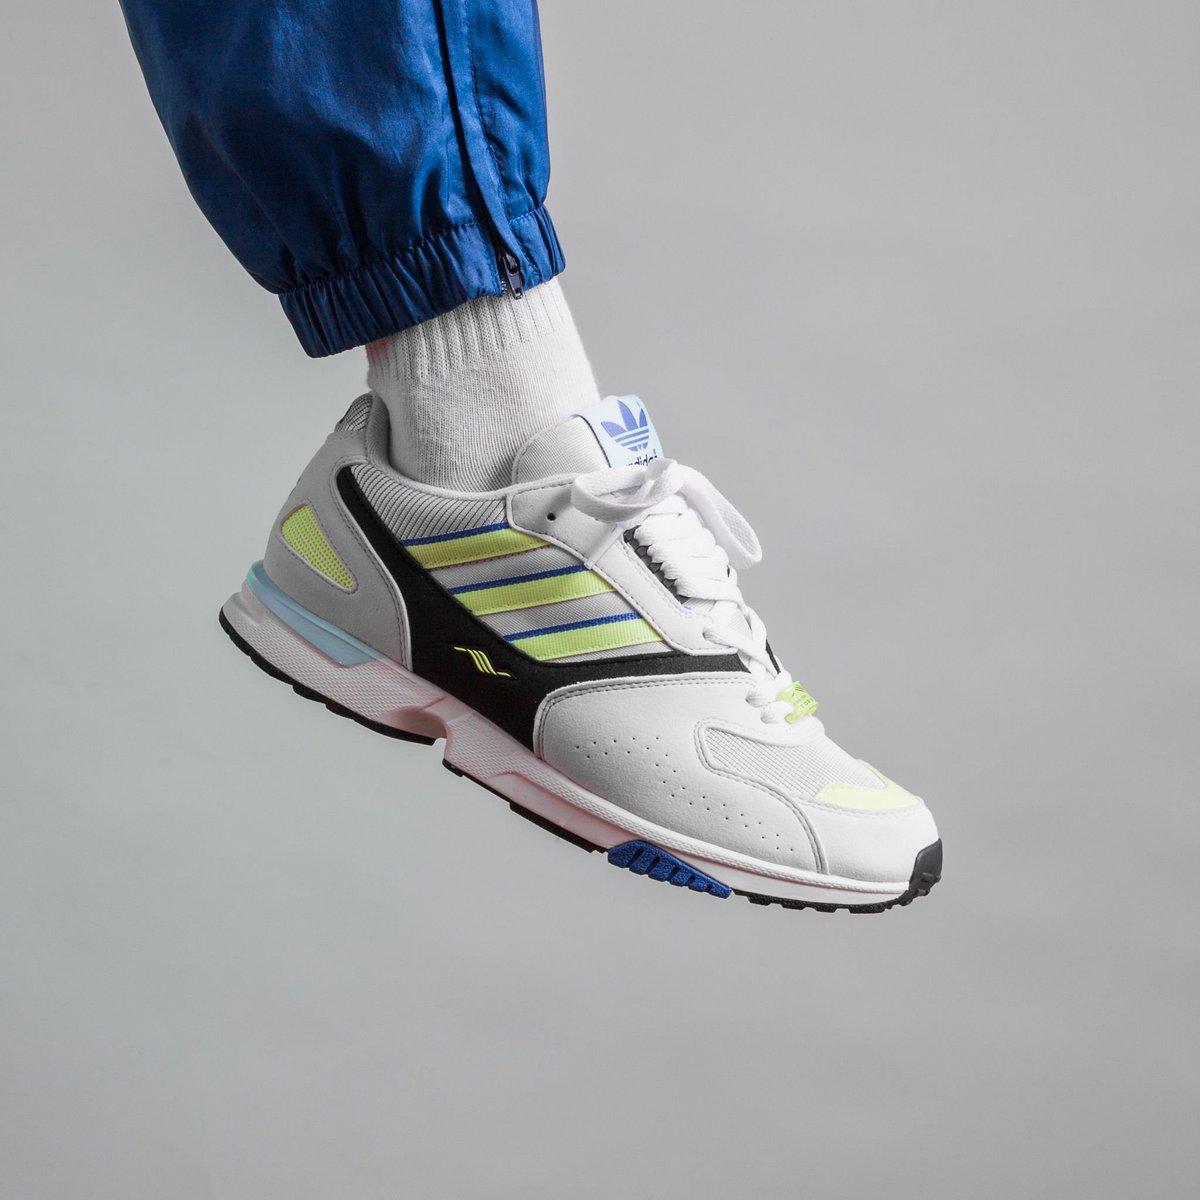 7e9f40667f3 Adidas Zx 4000 - Crystal White/Sesoye/Core Black shop:  https://t.co/b07zJOPUYa #zx4000 #adidas #new #fresh…  https://t.co/rGSg19ZZG8